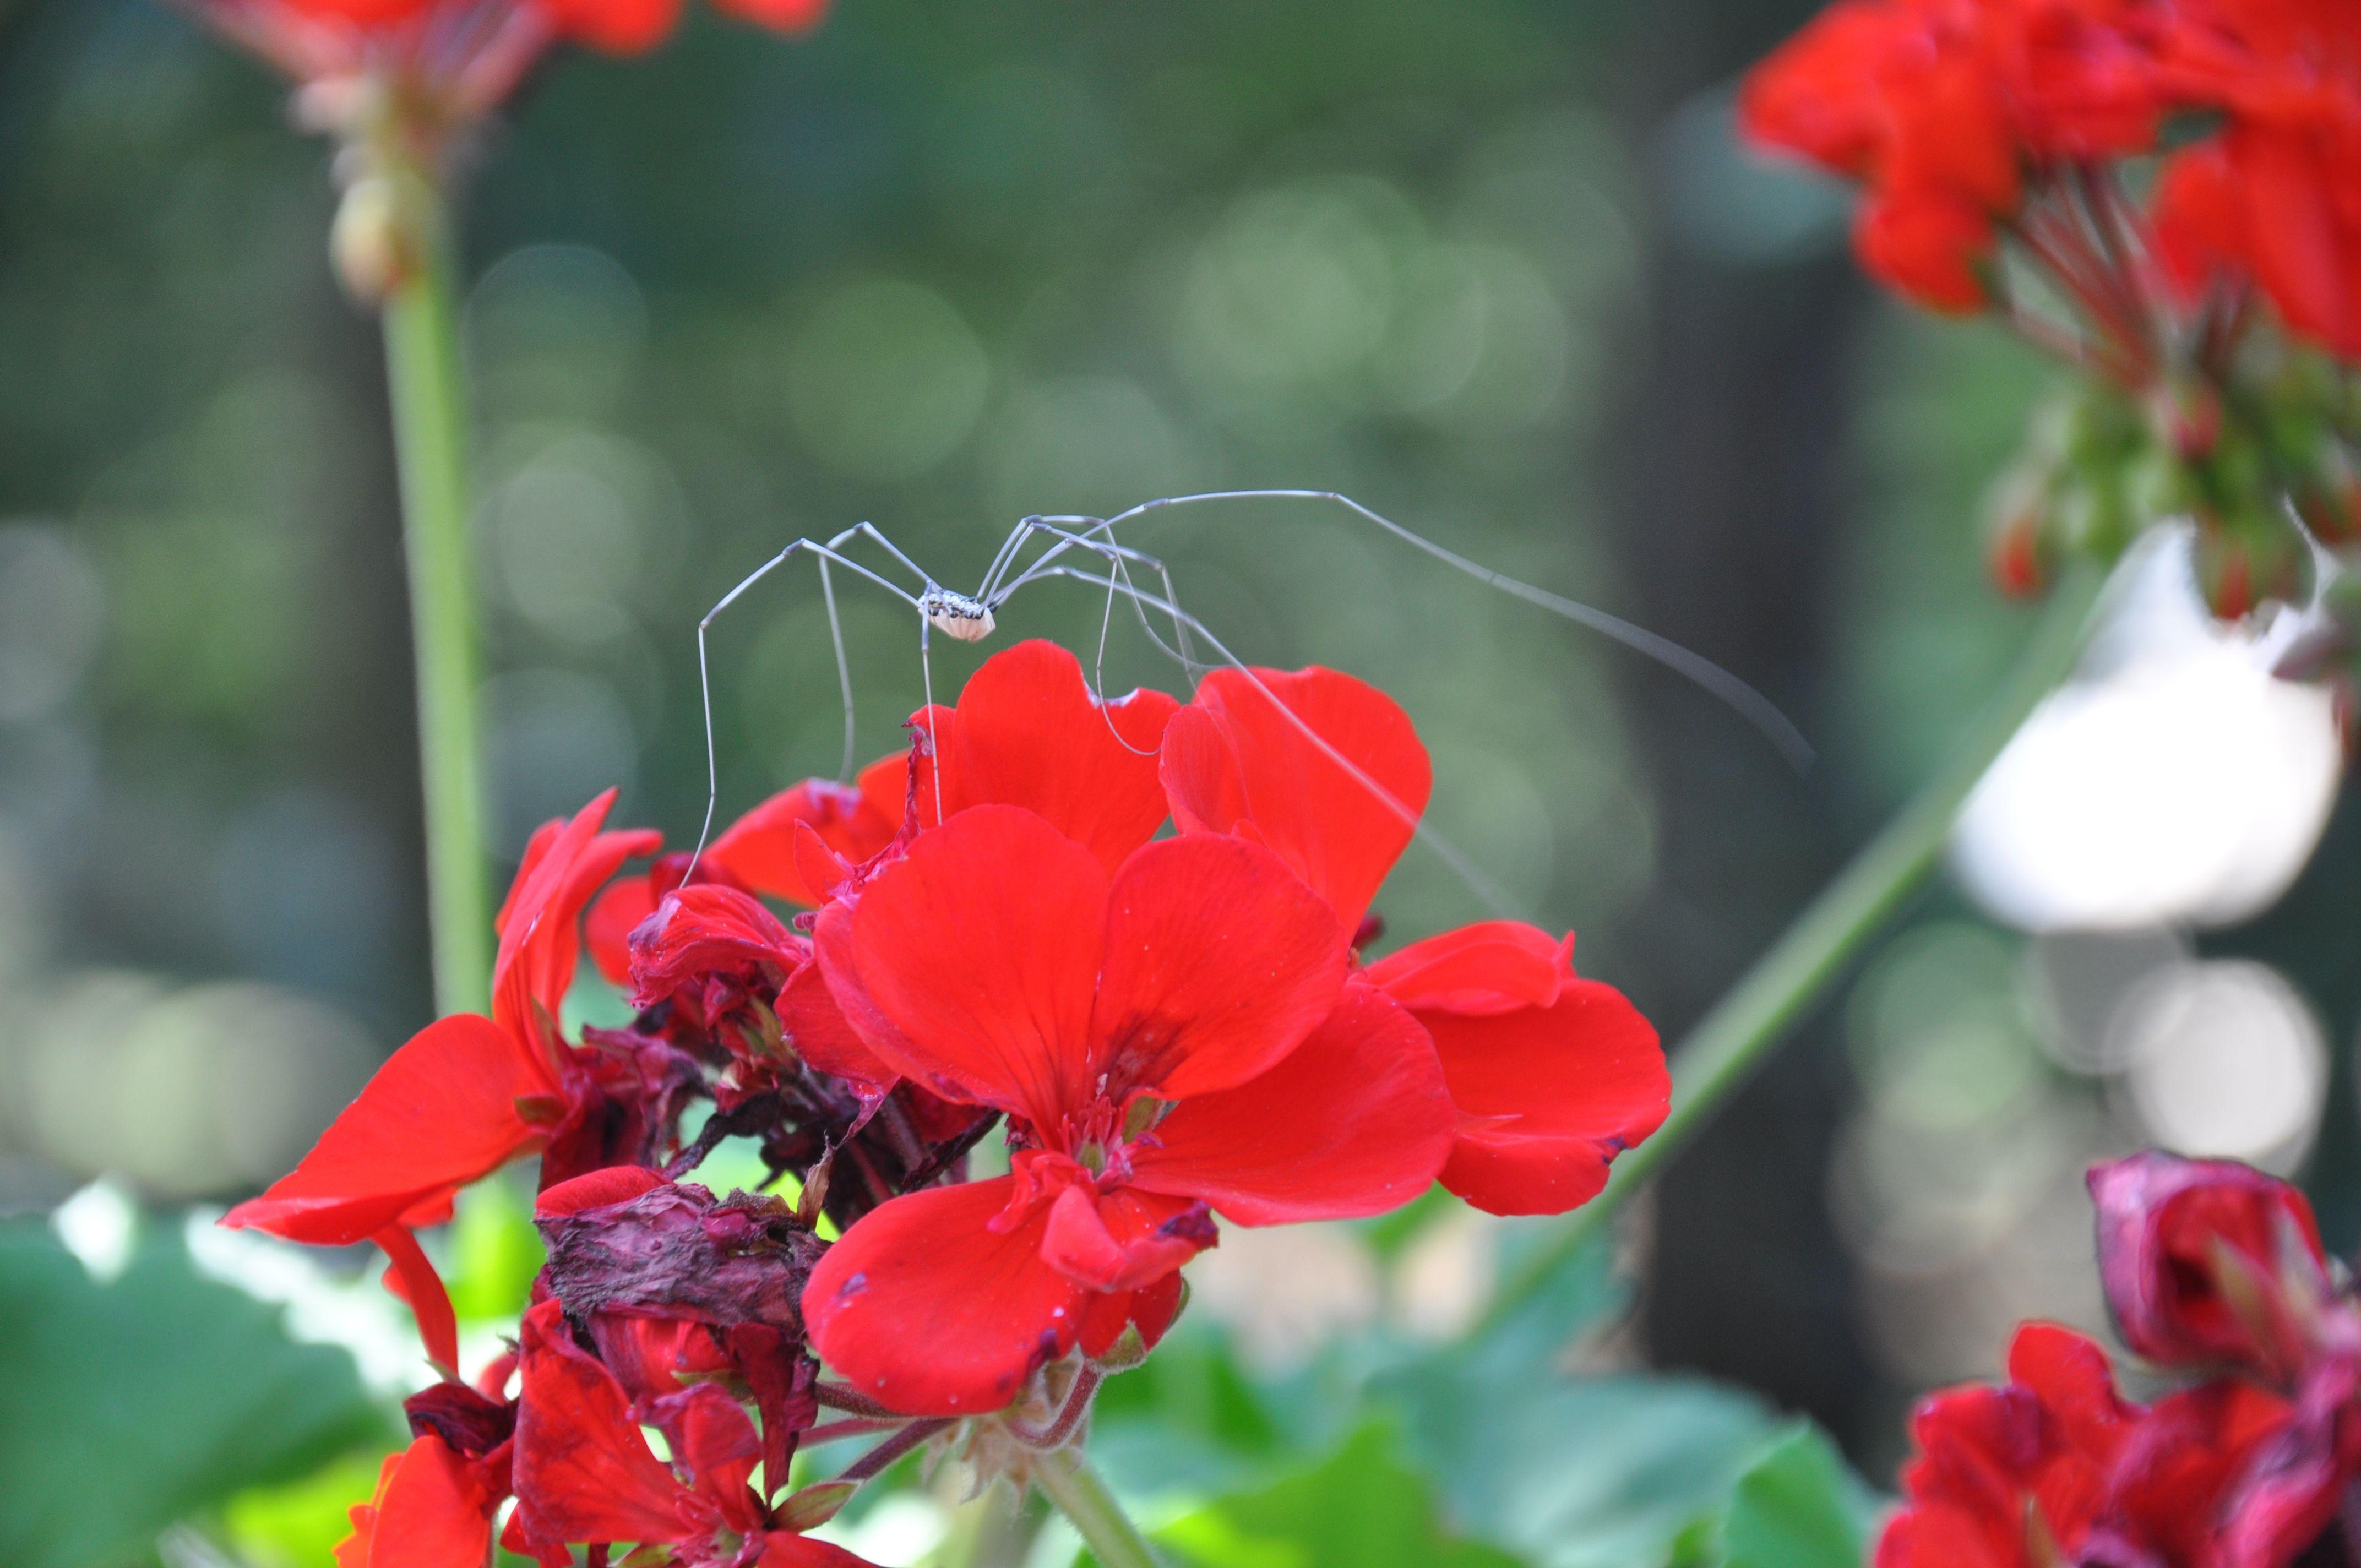 The Spider In The Backyard Cape Cod Backyard Spider